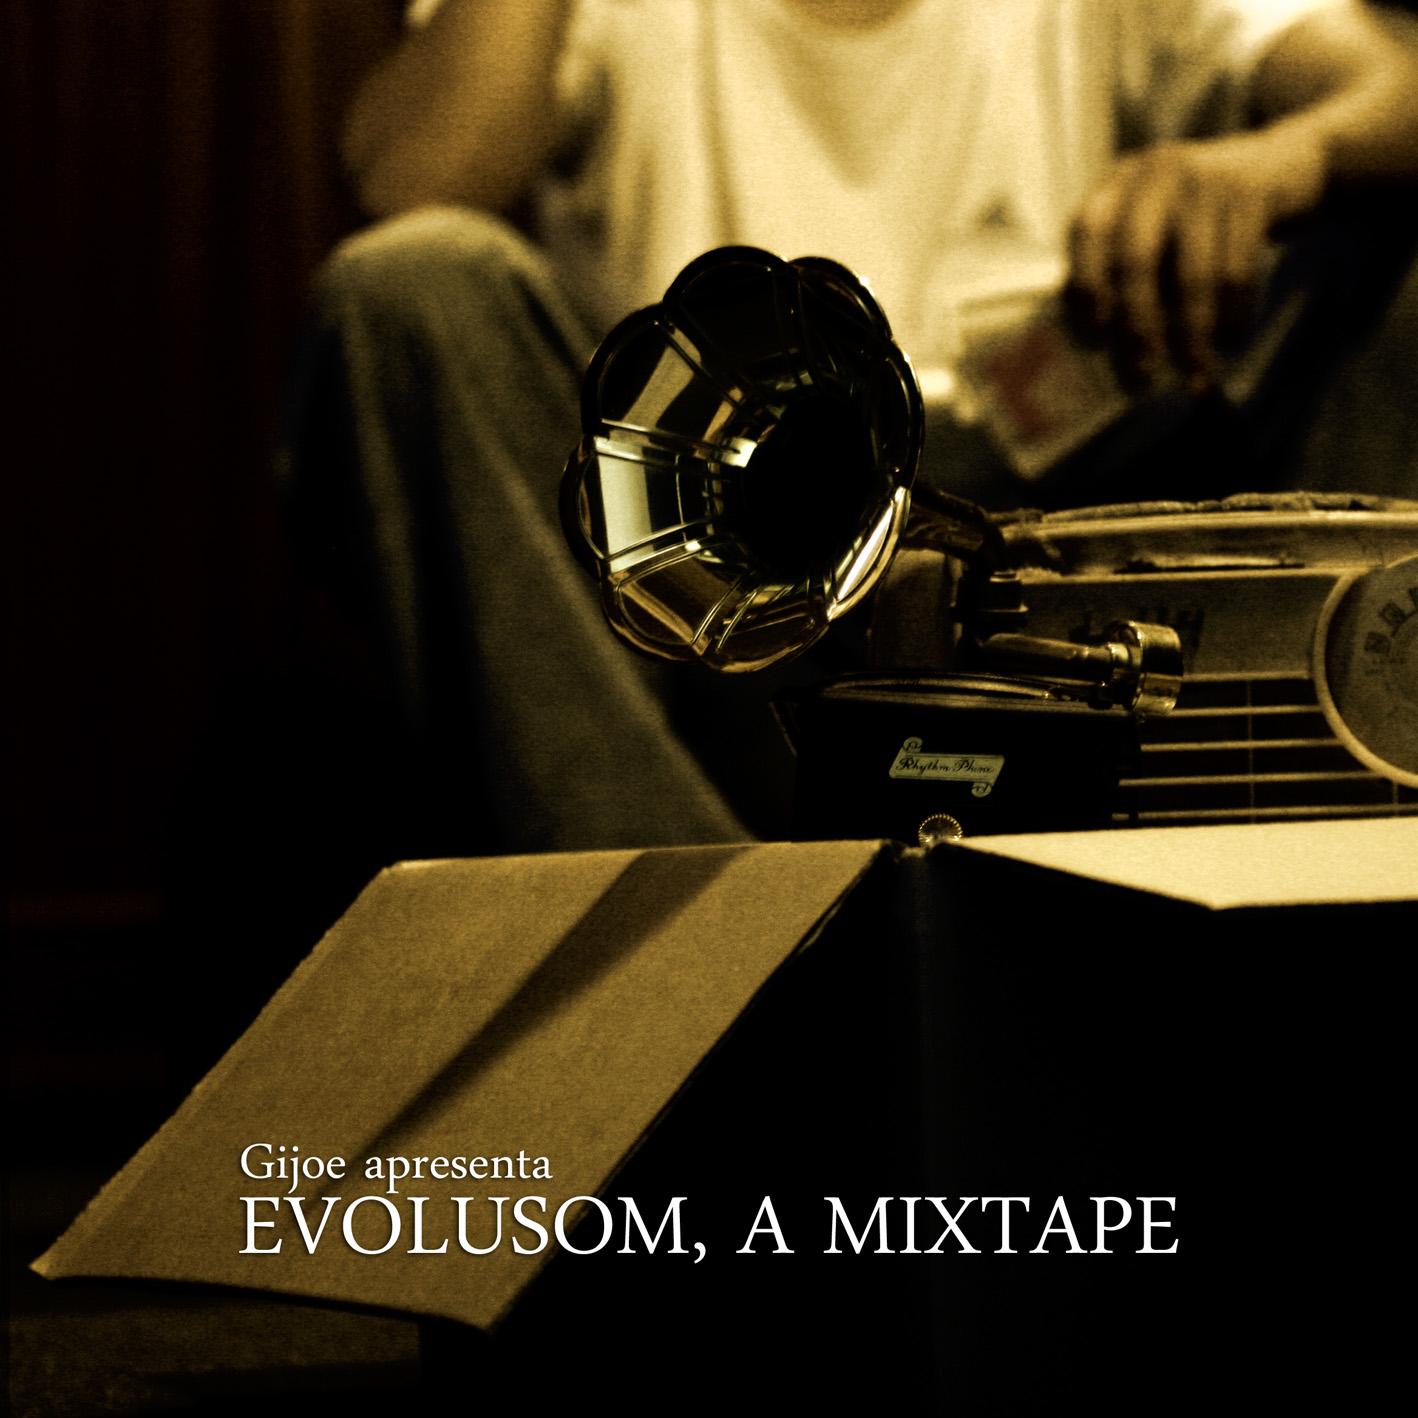 Evolusom, a mixtape